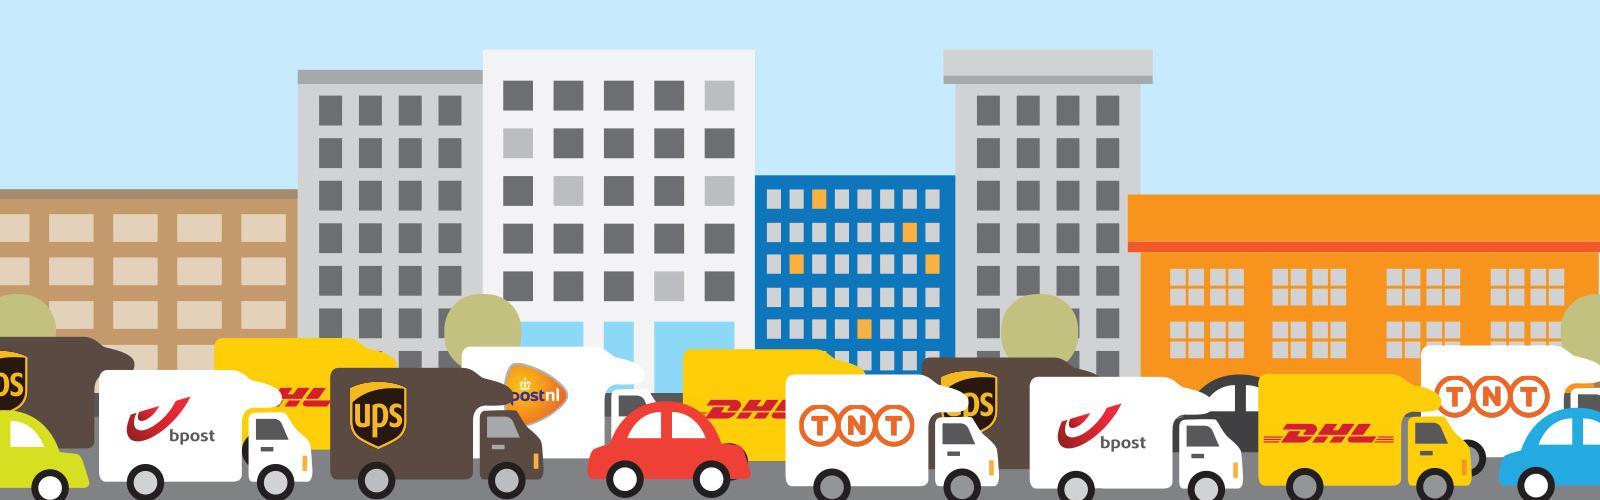 beeld debat e-commerce